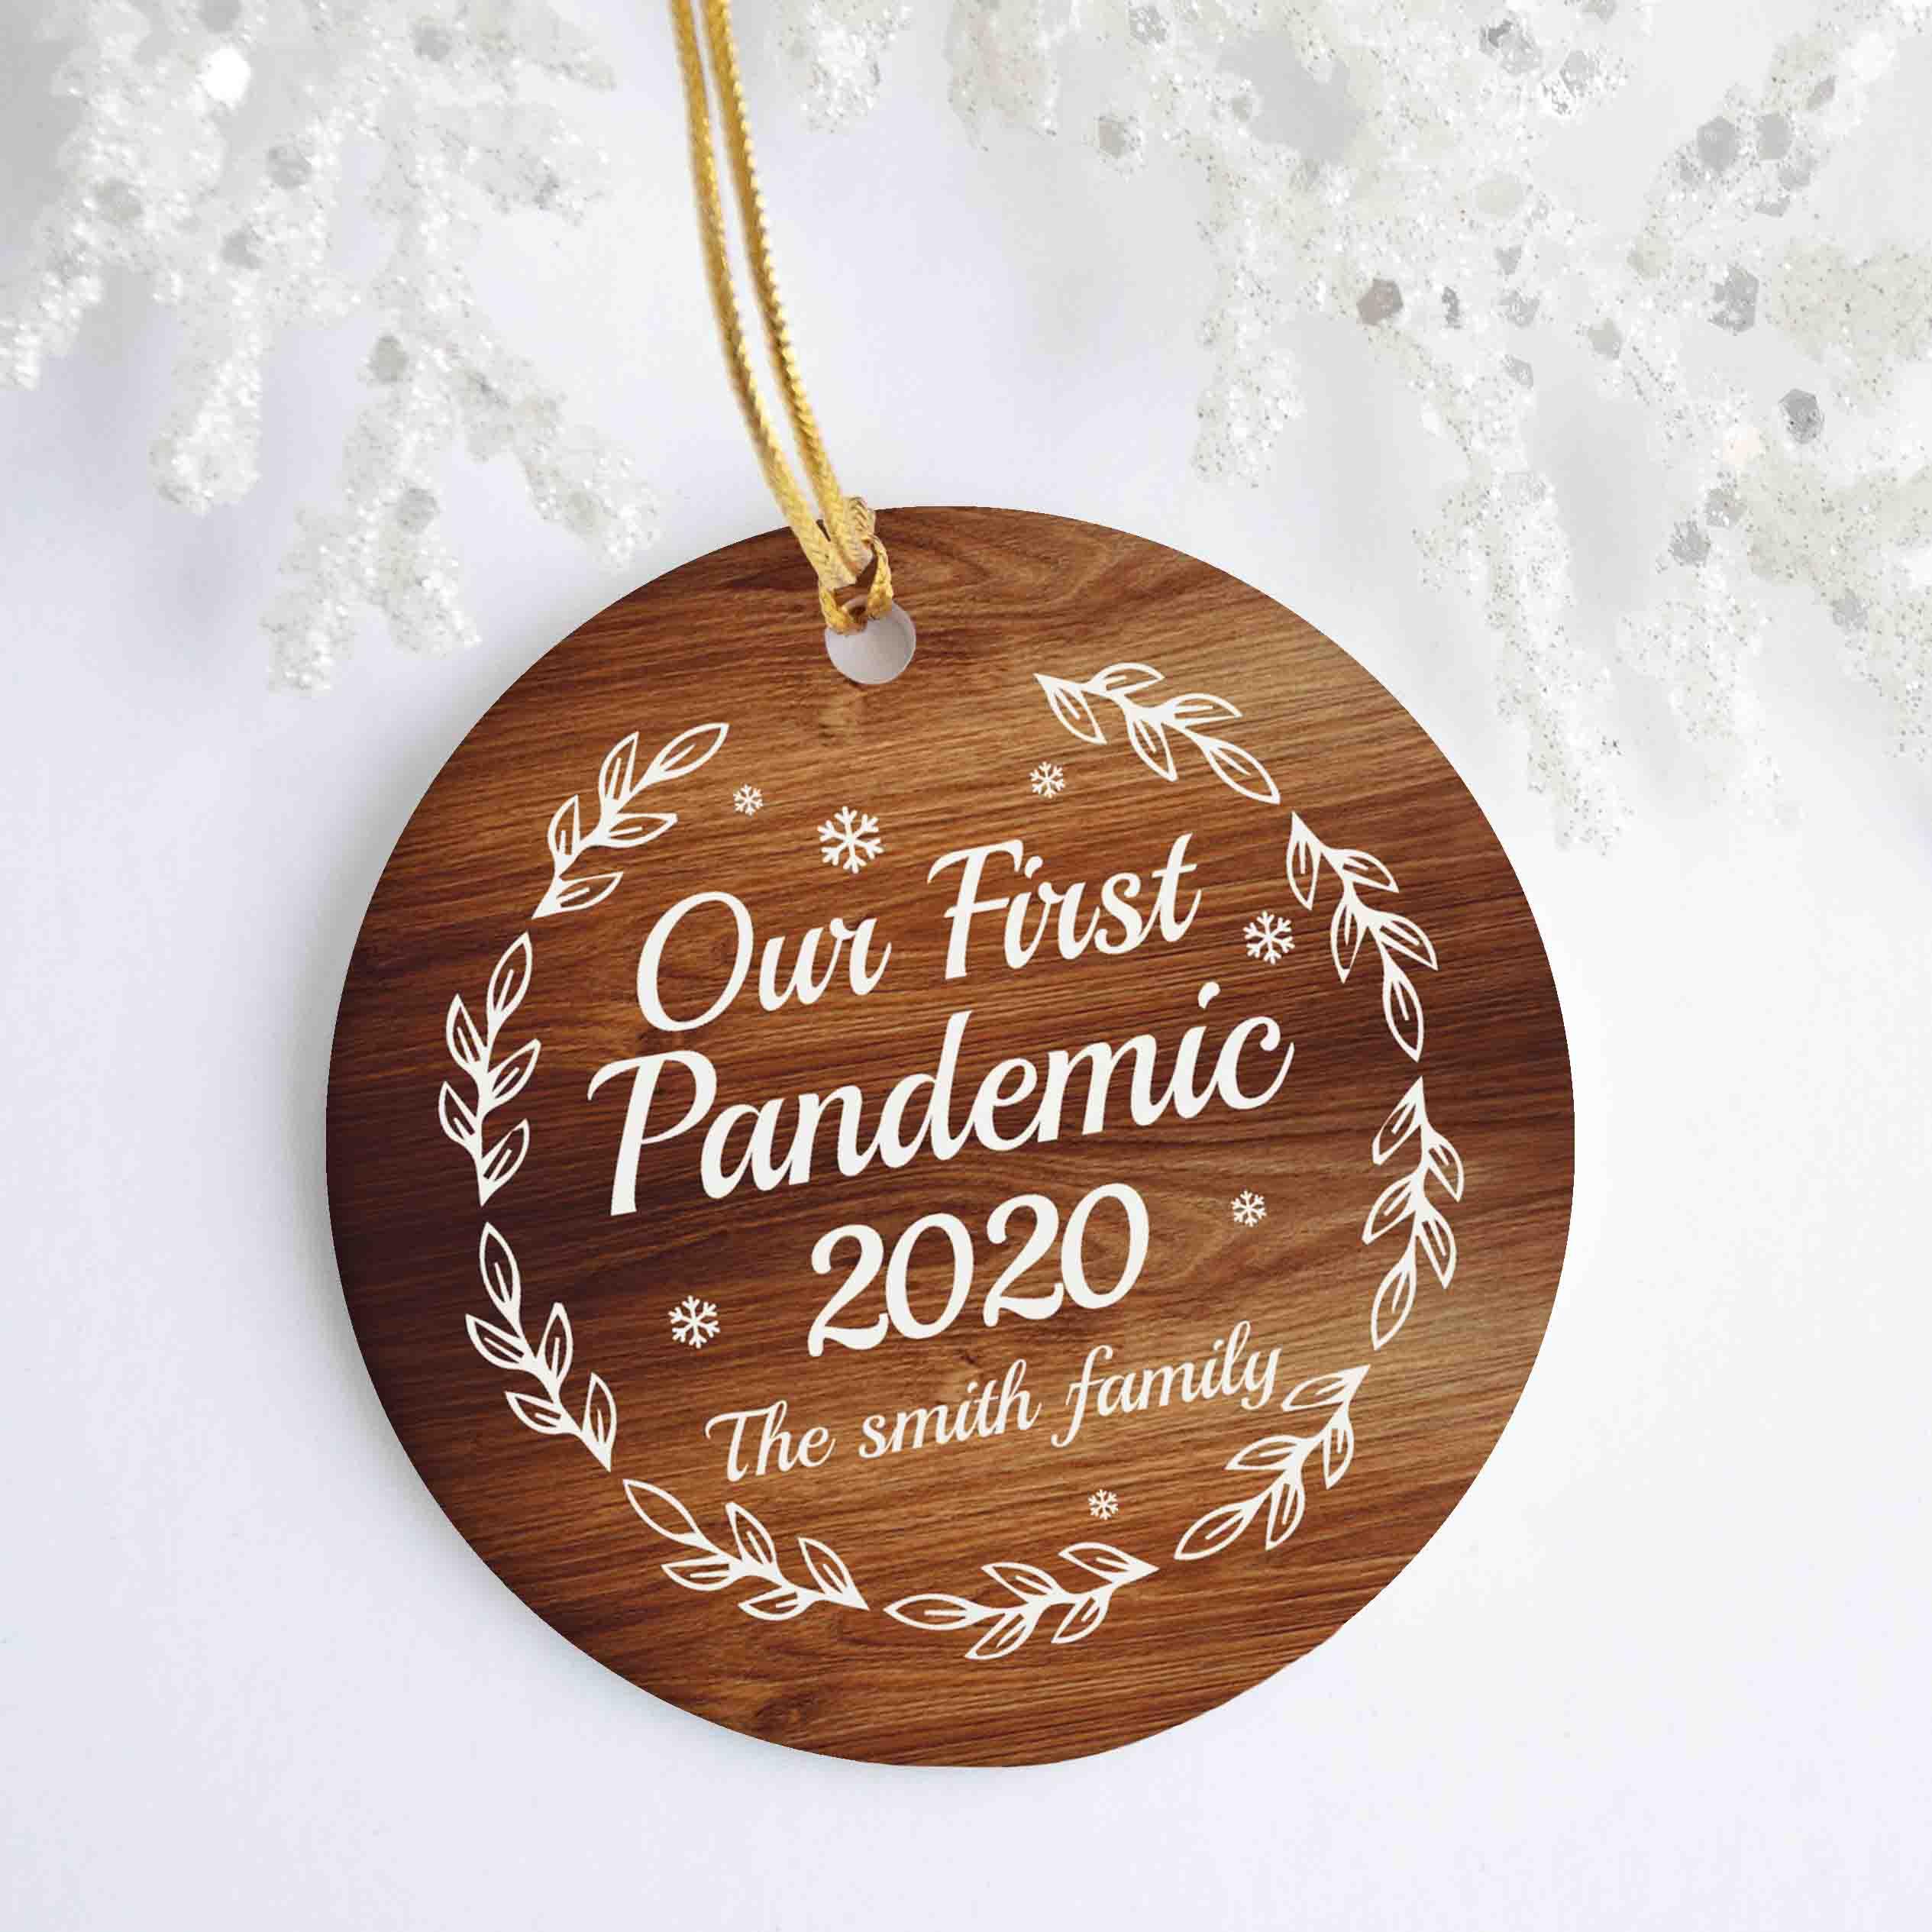 Doa Group 2020 12 03 07.46.43 Personalized Christmas Ornament 2 - Cubebik